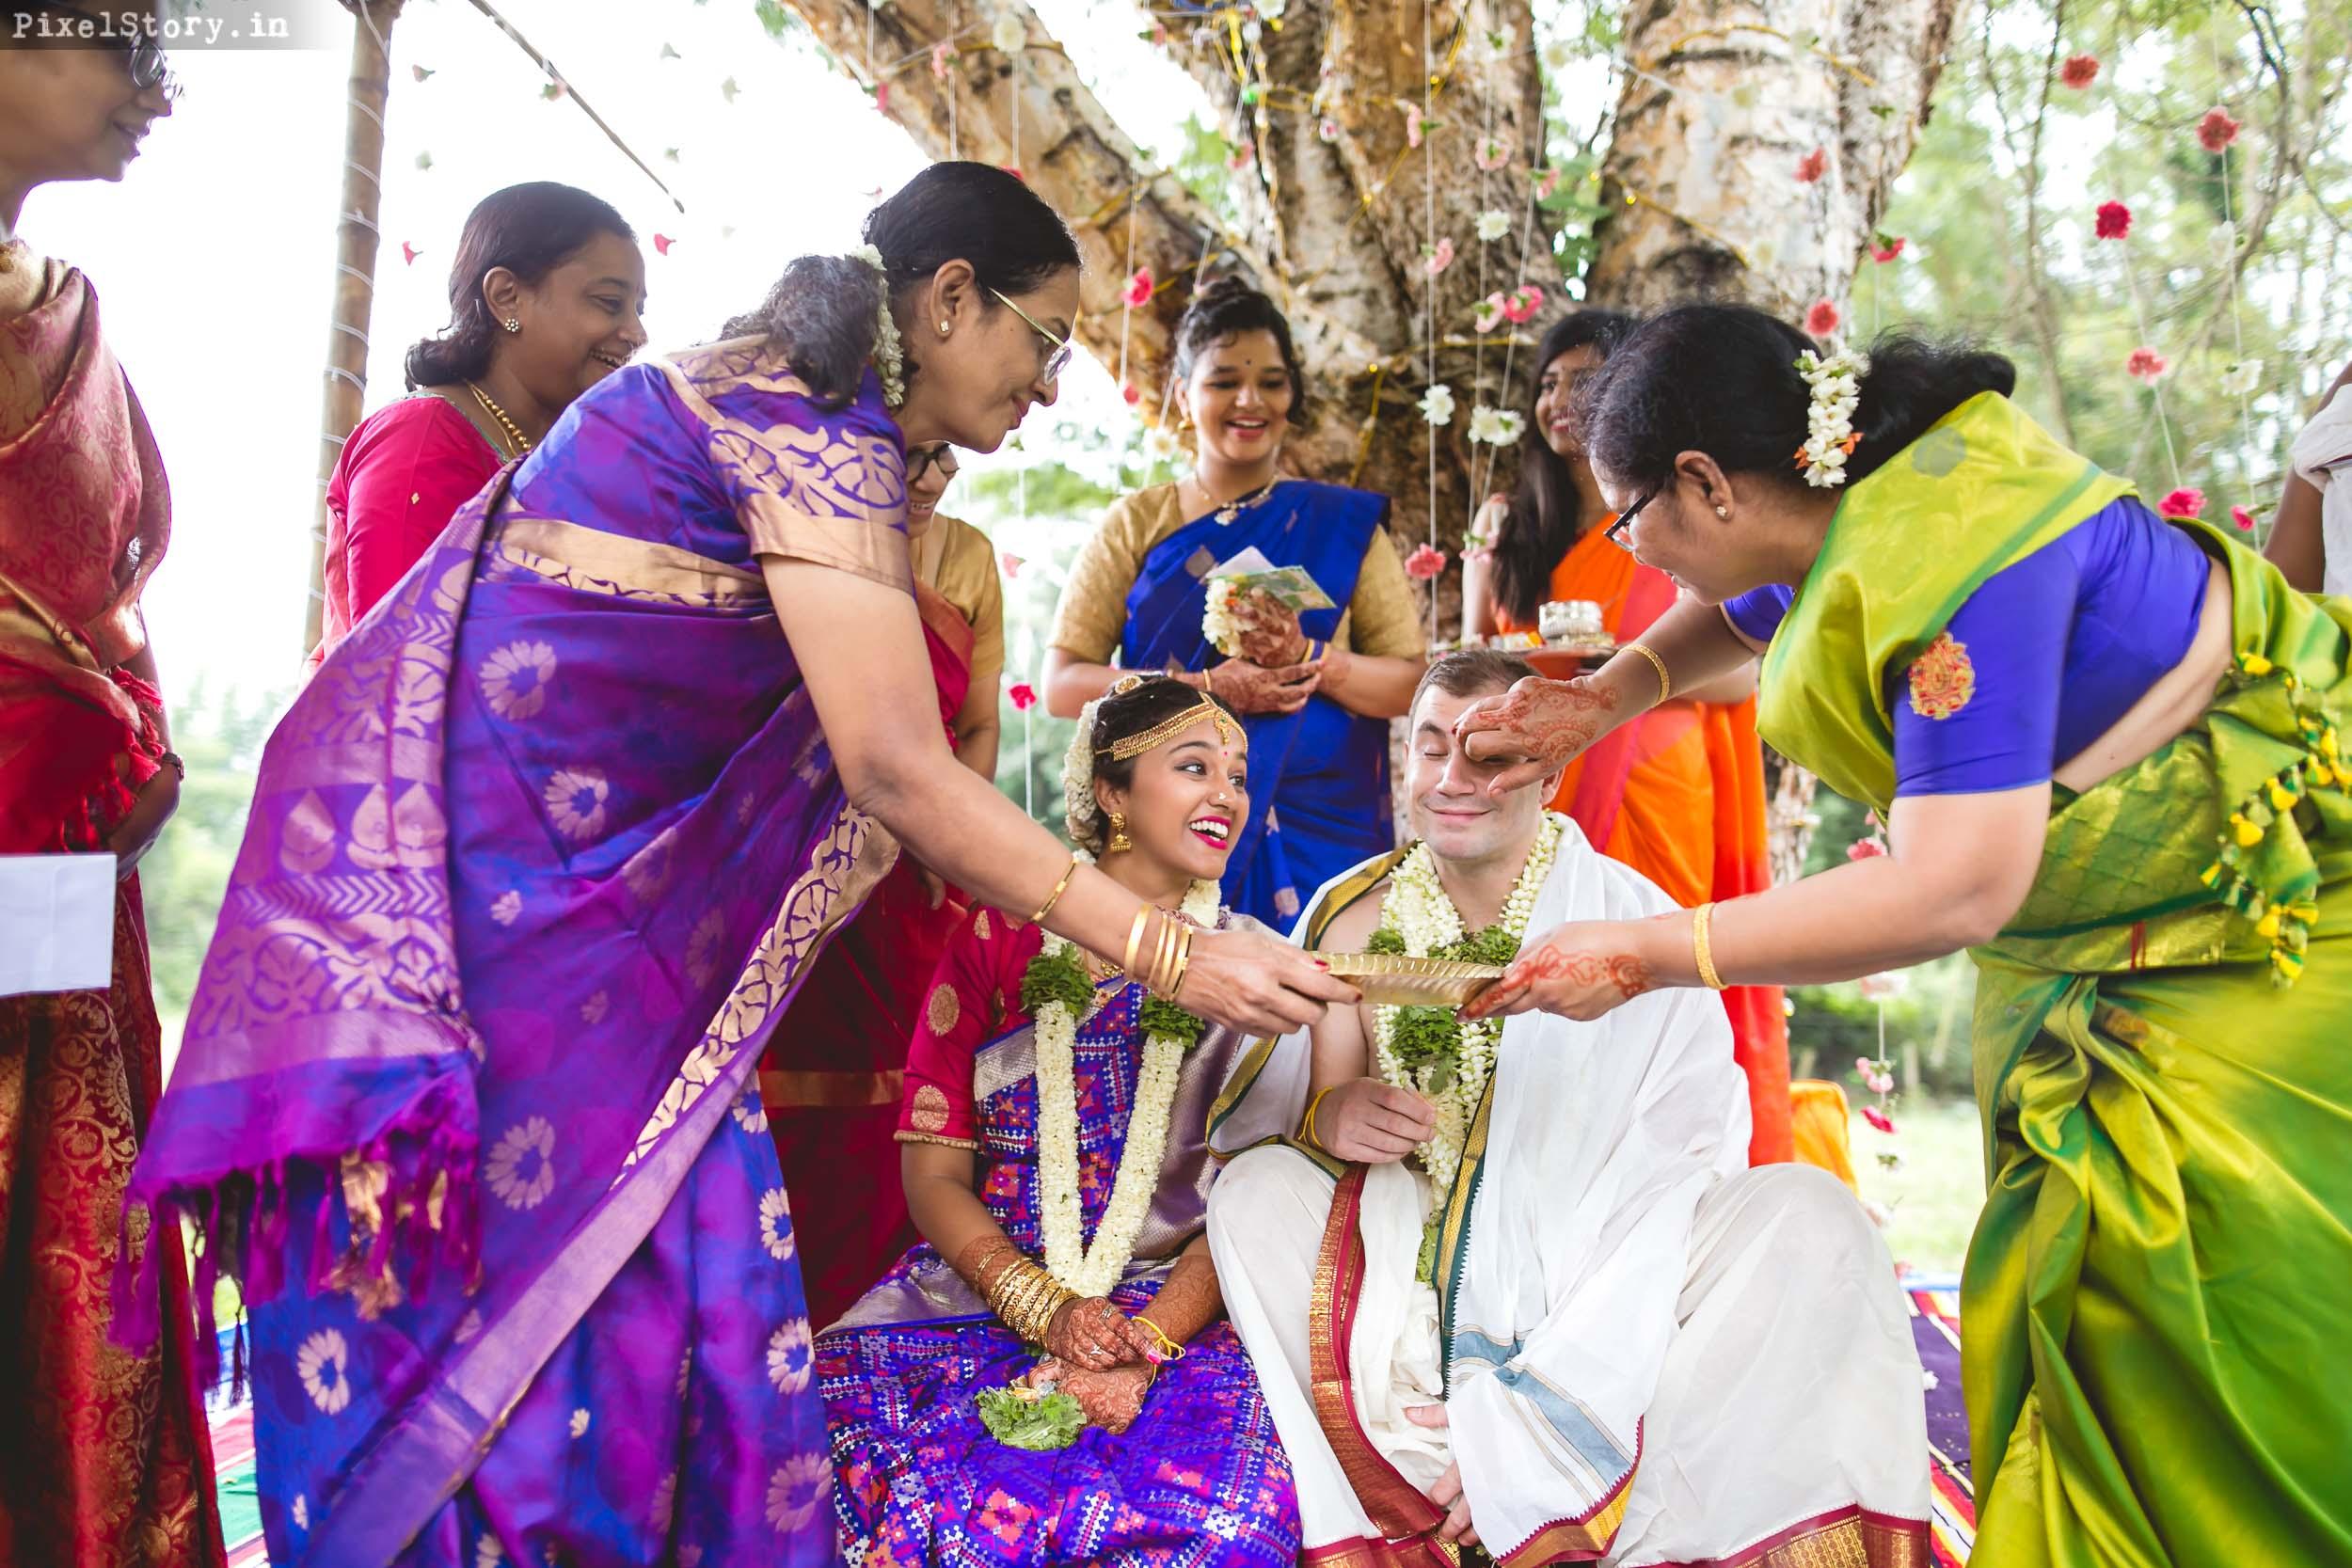 PixelStory-Jungle-Wedding-Photographer-Masinagudi-Indo-French077.jpg